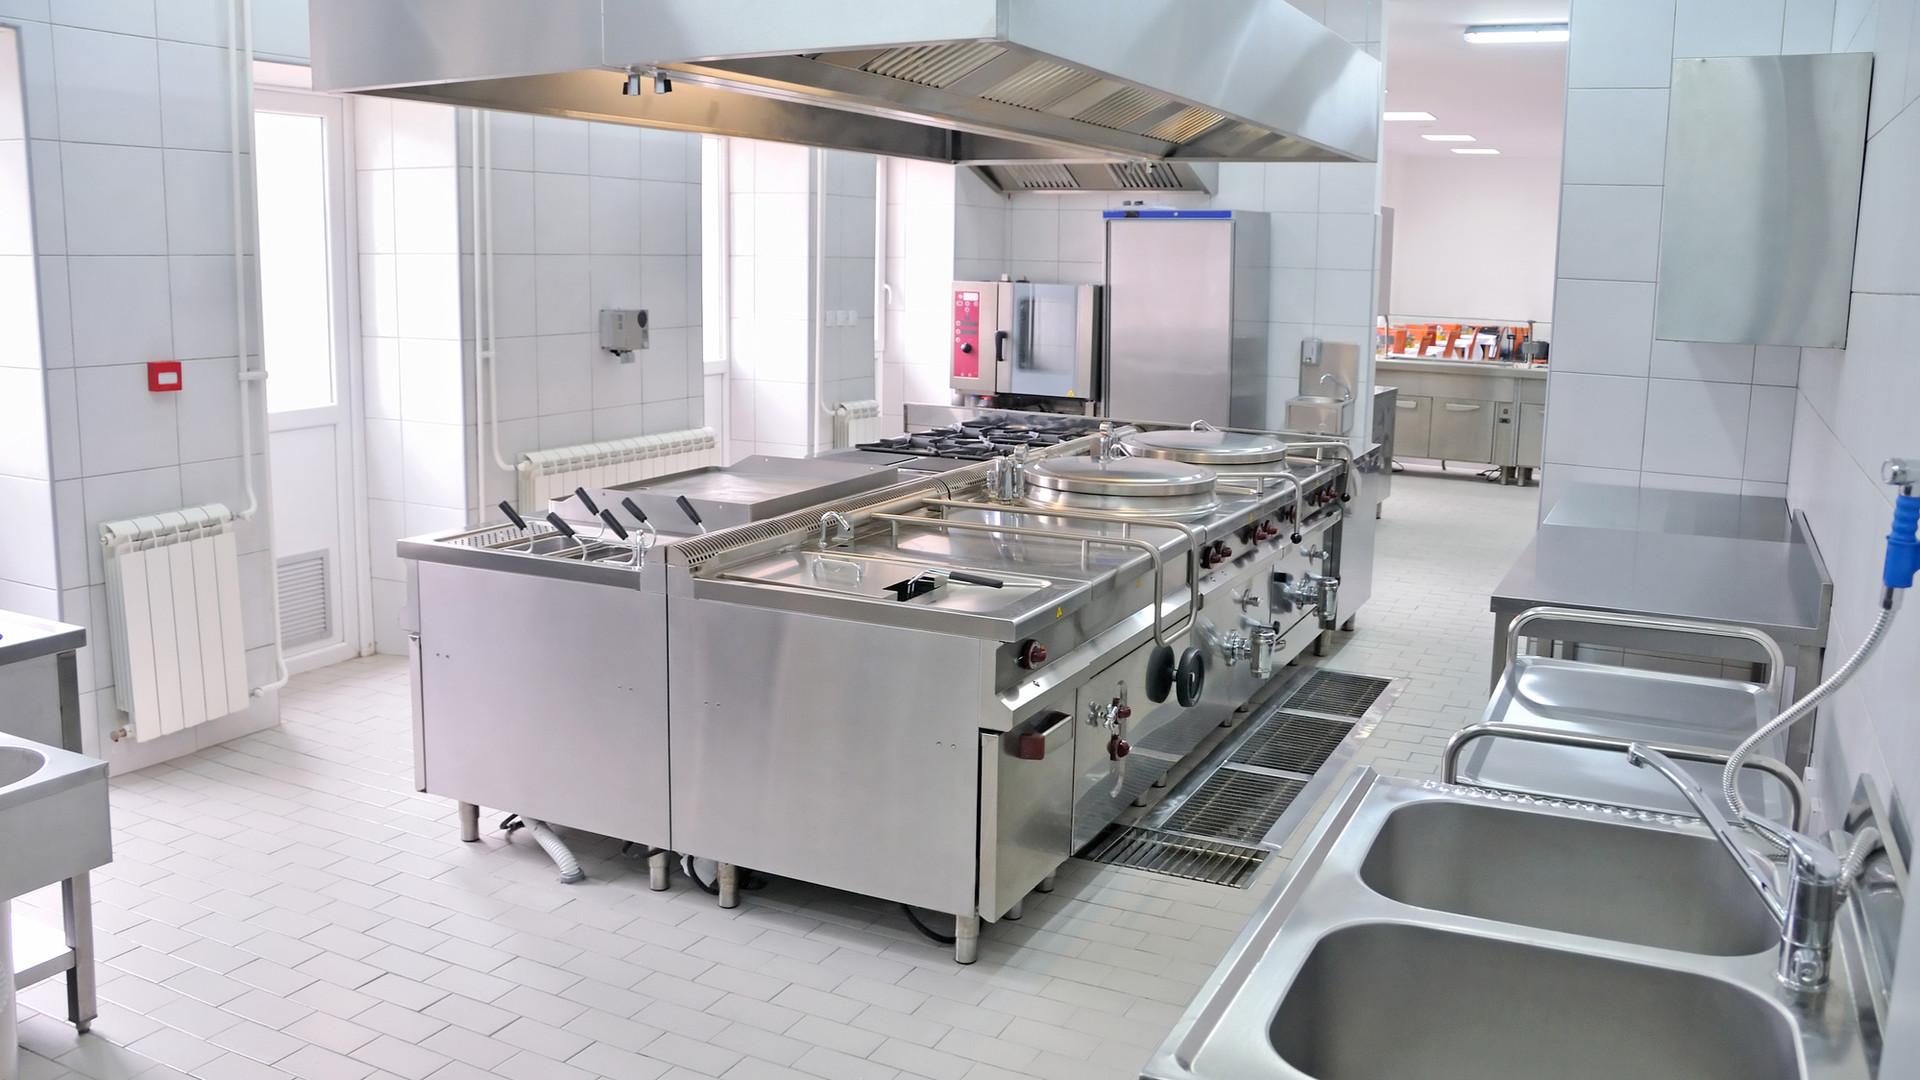 used-kitchen-equipment.jpg